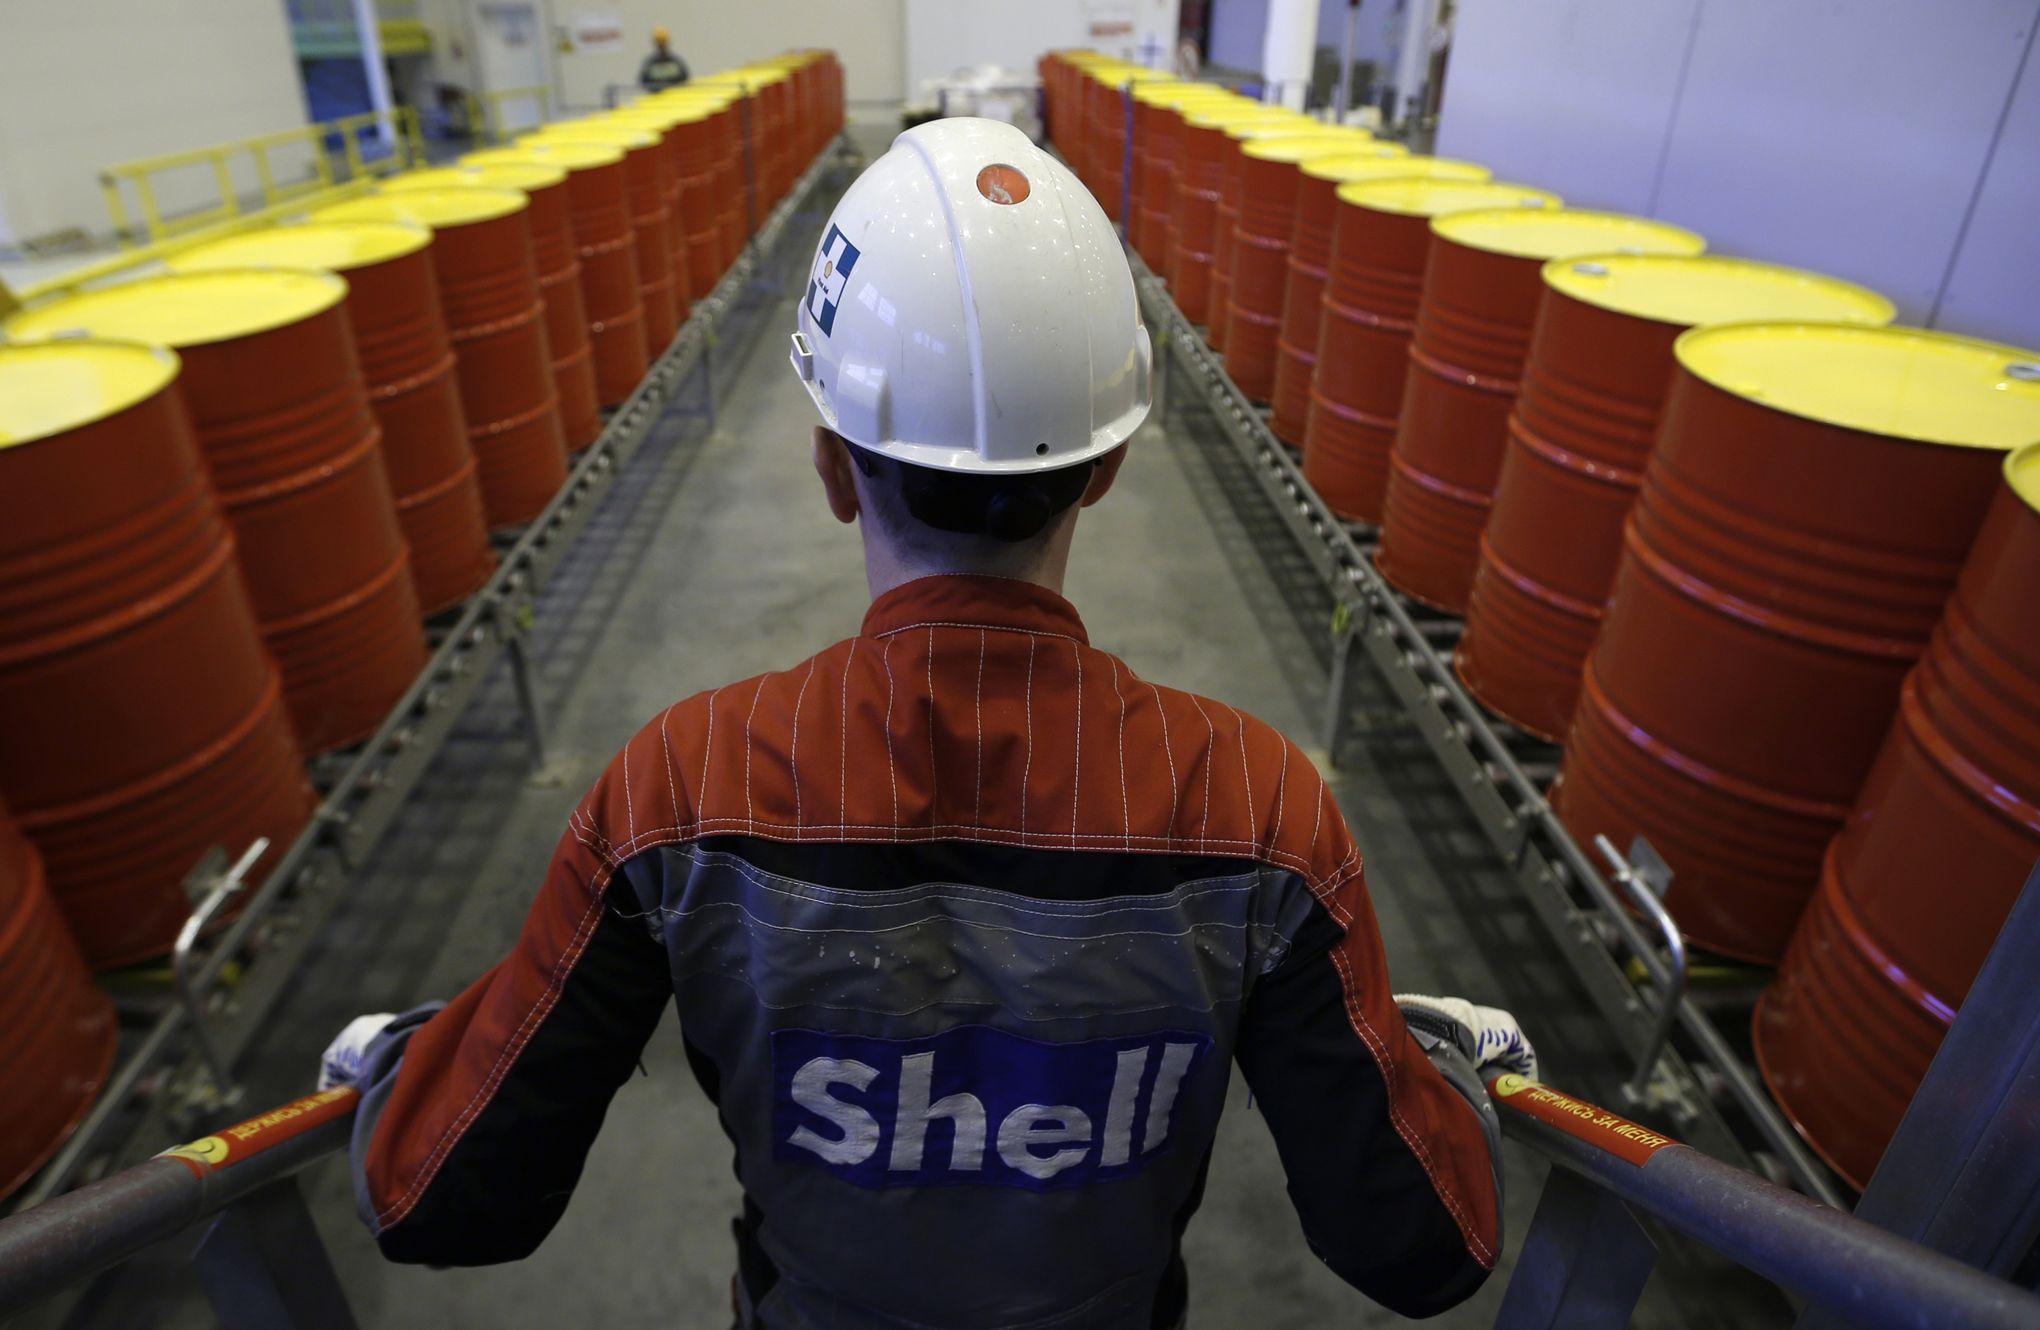 pétrole shell